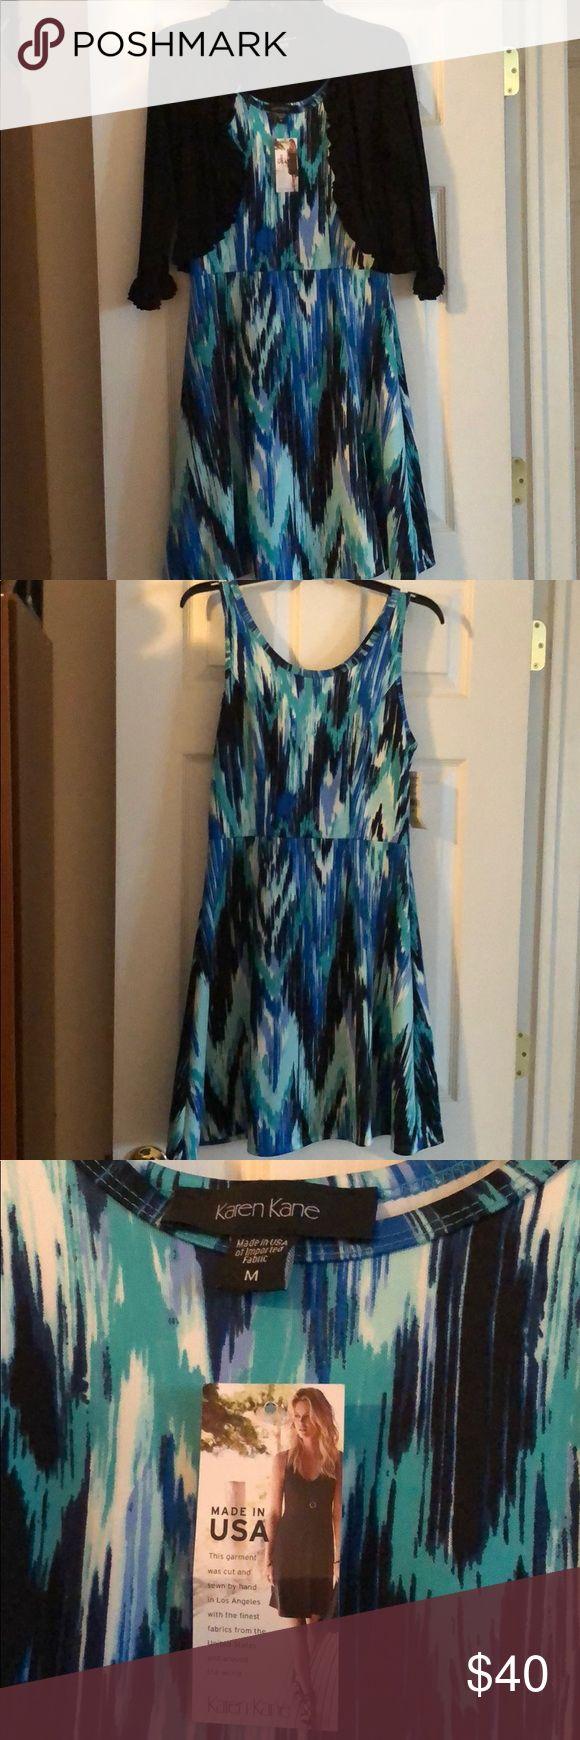 NWT Karen Kane A-line Dress Karen Kane stretchy, comfortable, A-line dress. Hits above knee. Shades of blue/black/white design, Polyester/Spandex blend Shrug not for sale Karen Kane Dresses